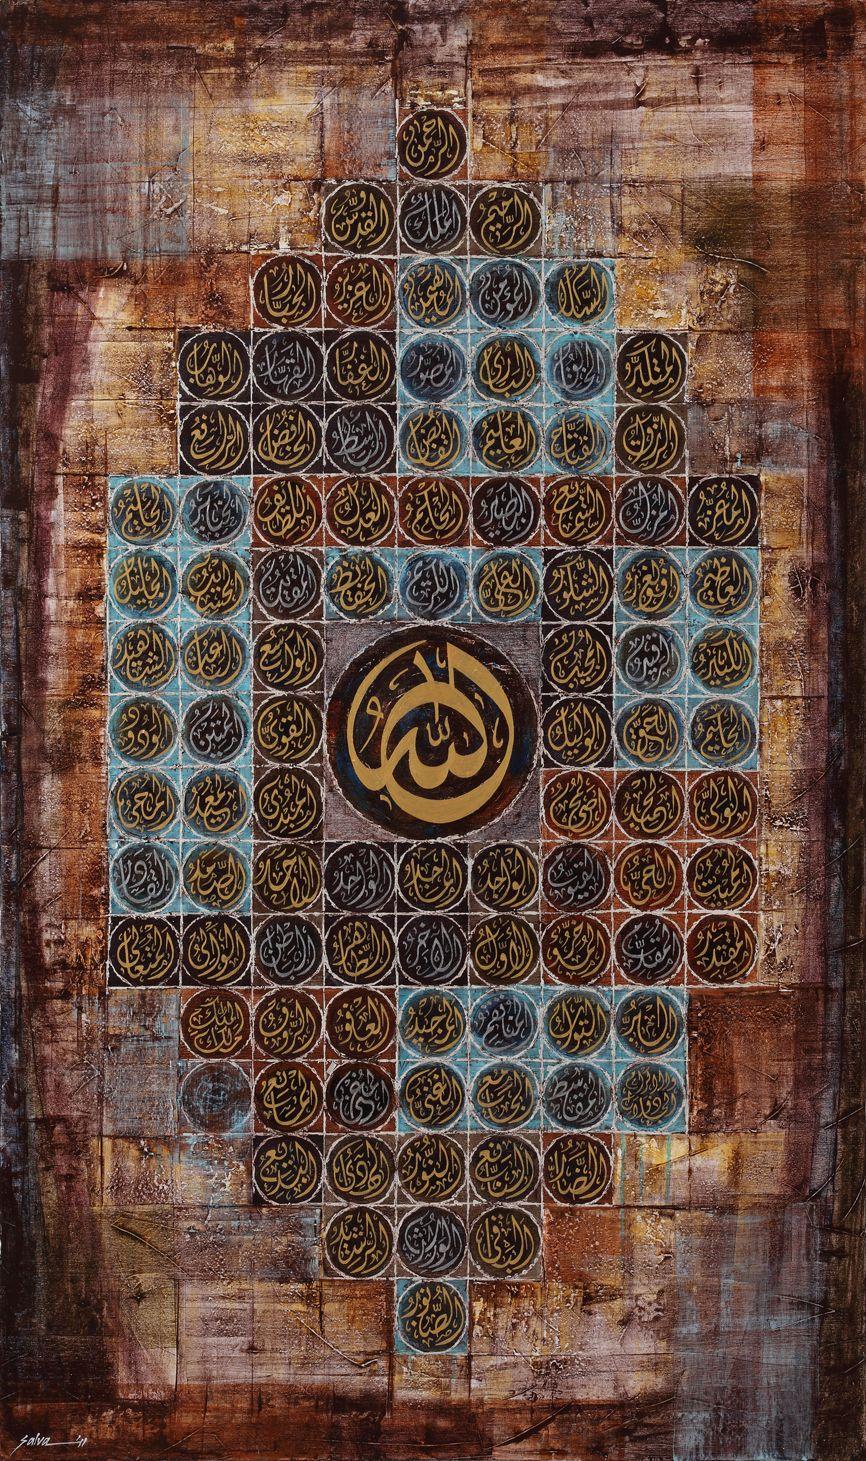 Contemporary Arabic Calligraphy Art @portfoliobox  Asma ul Husna by Salva Rasool